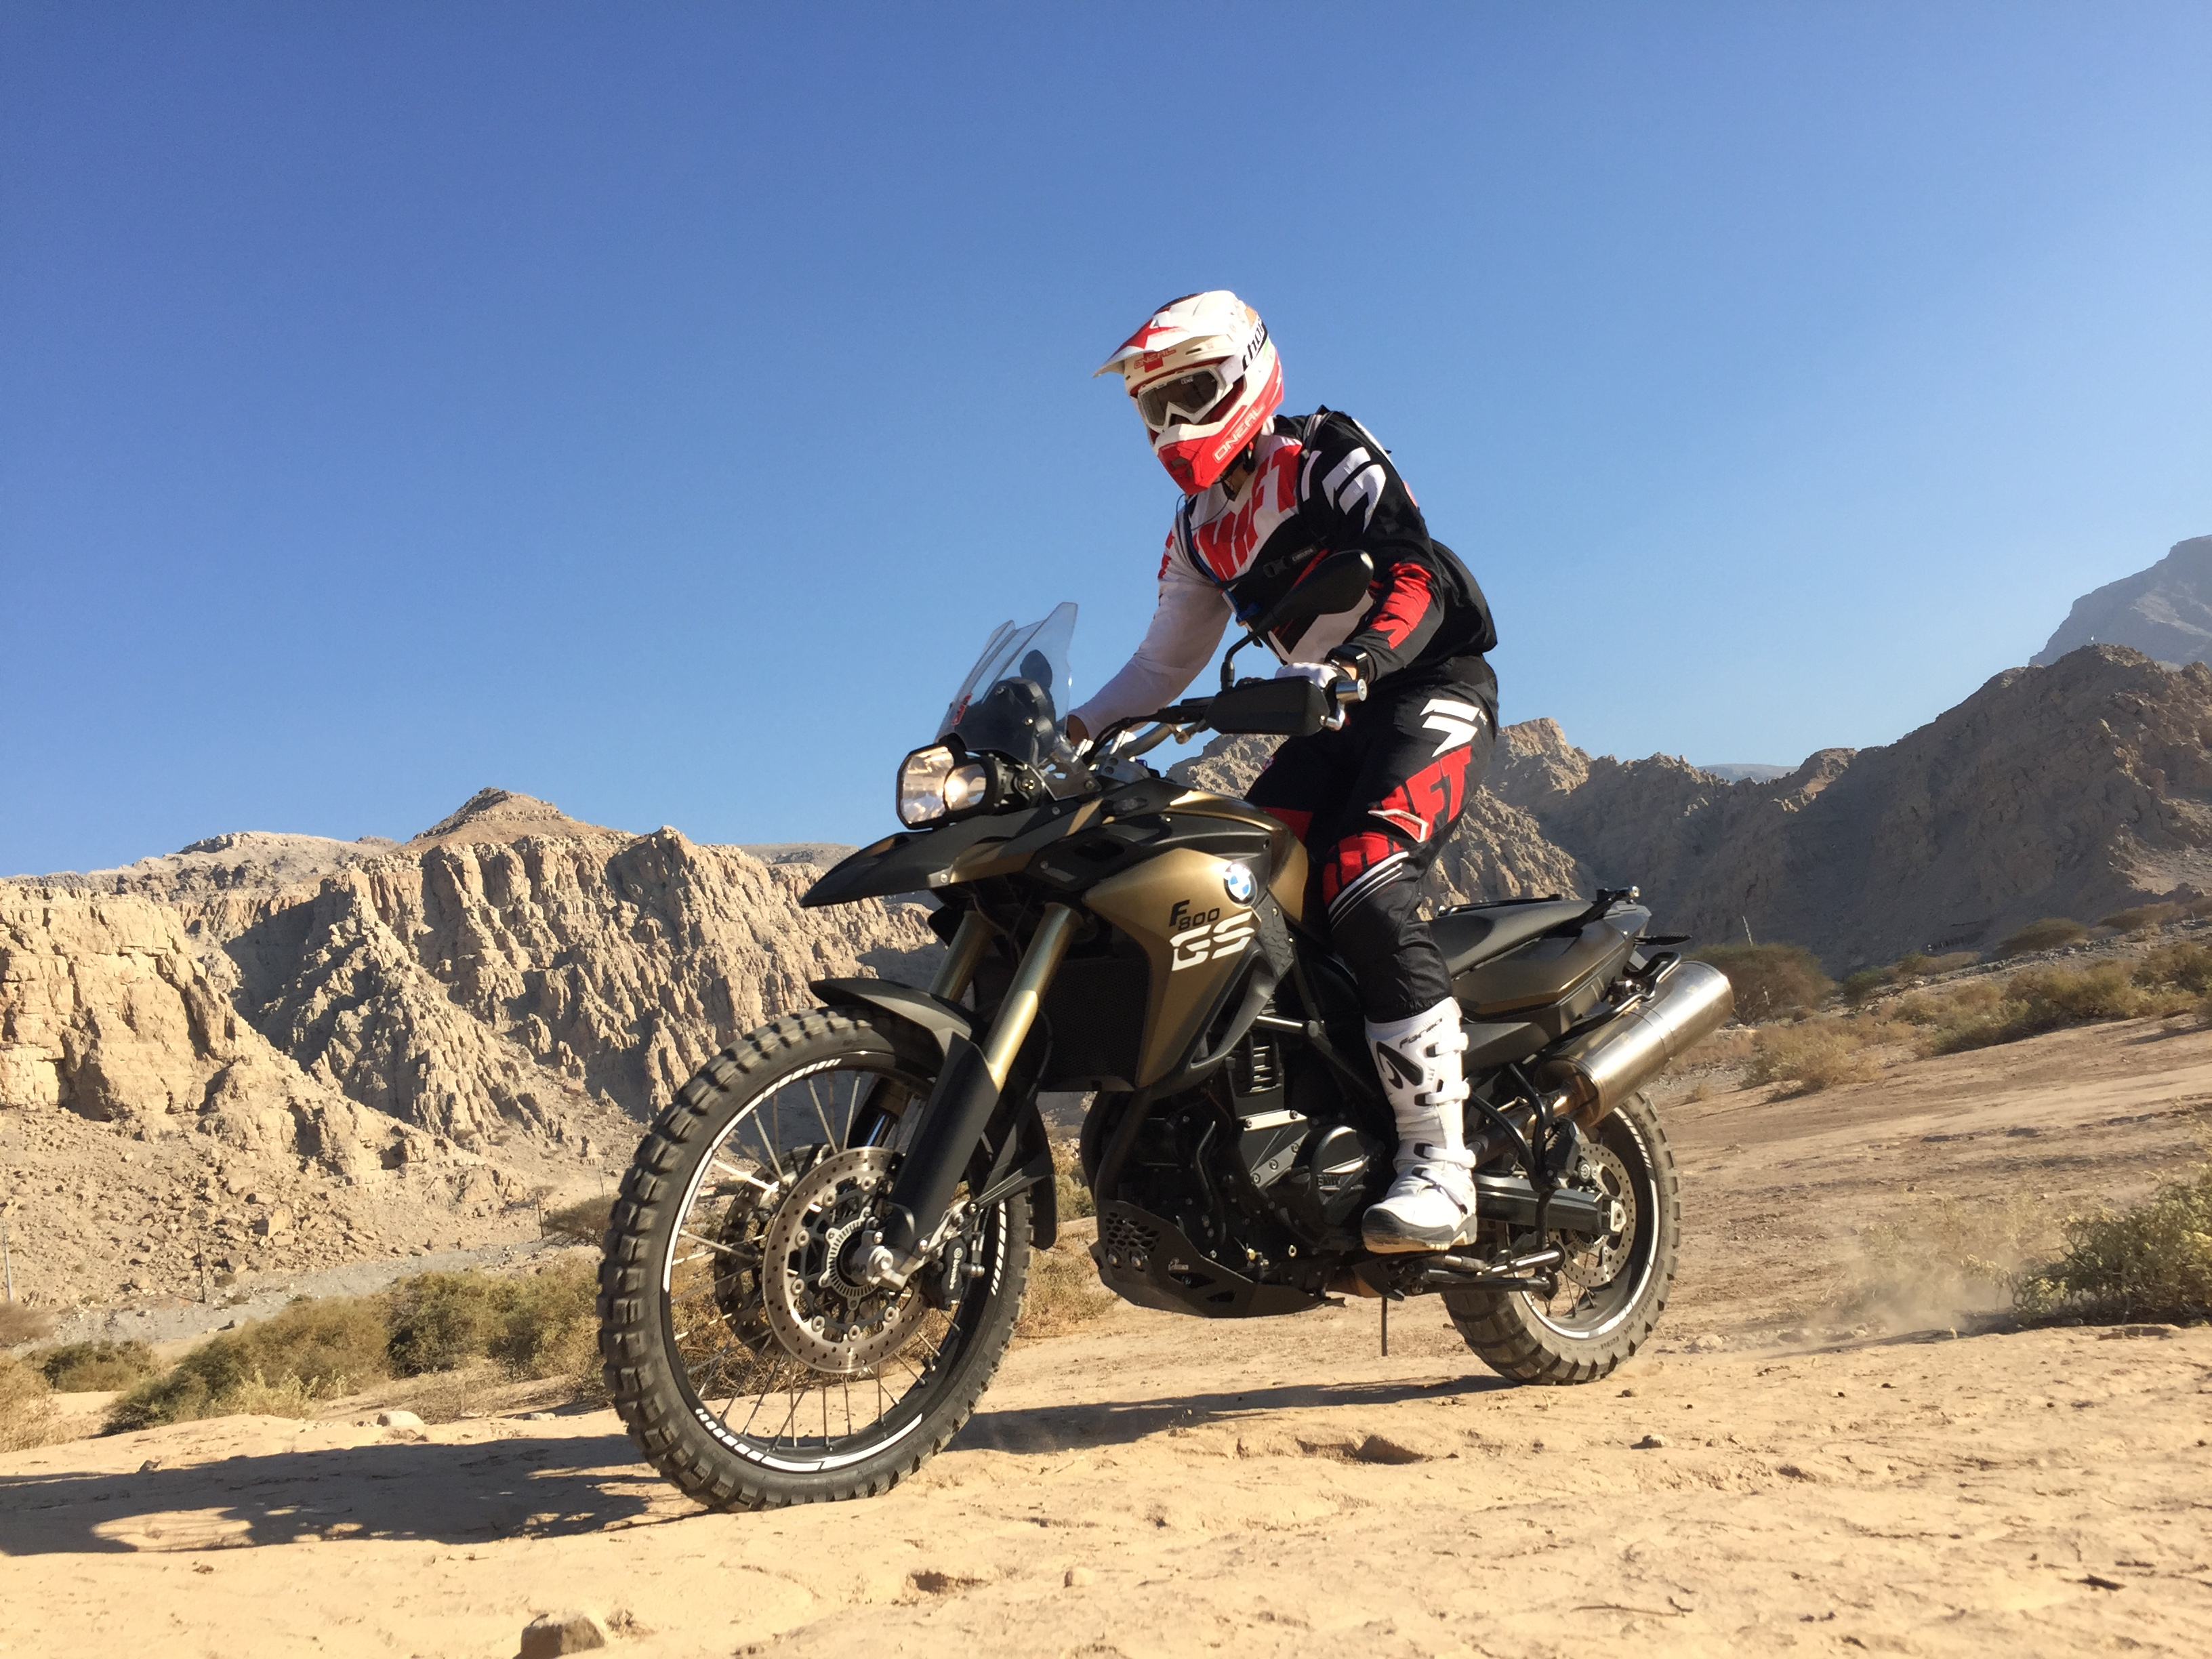 Motor cycle tour in Dubai